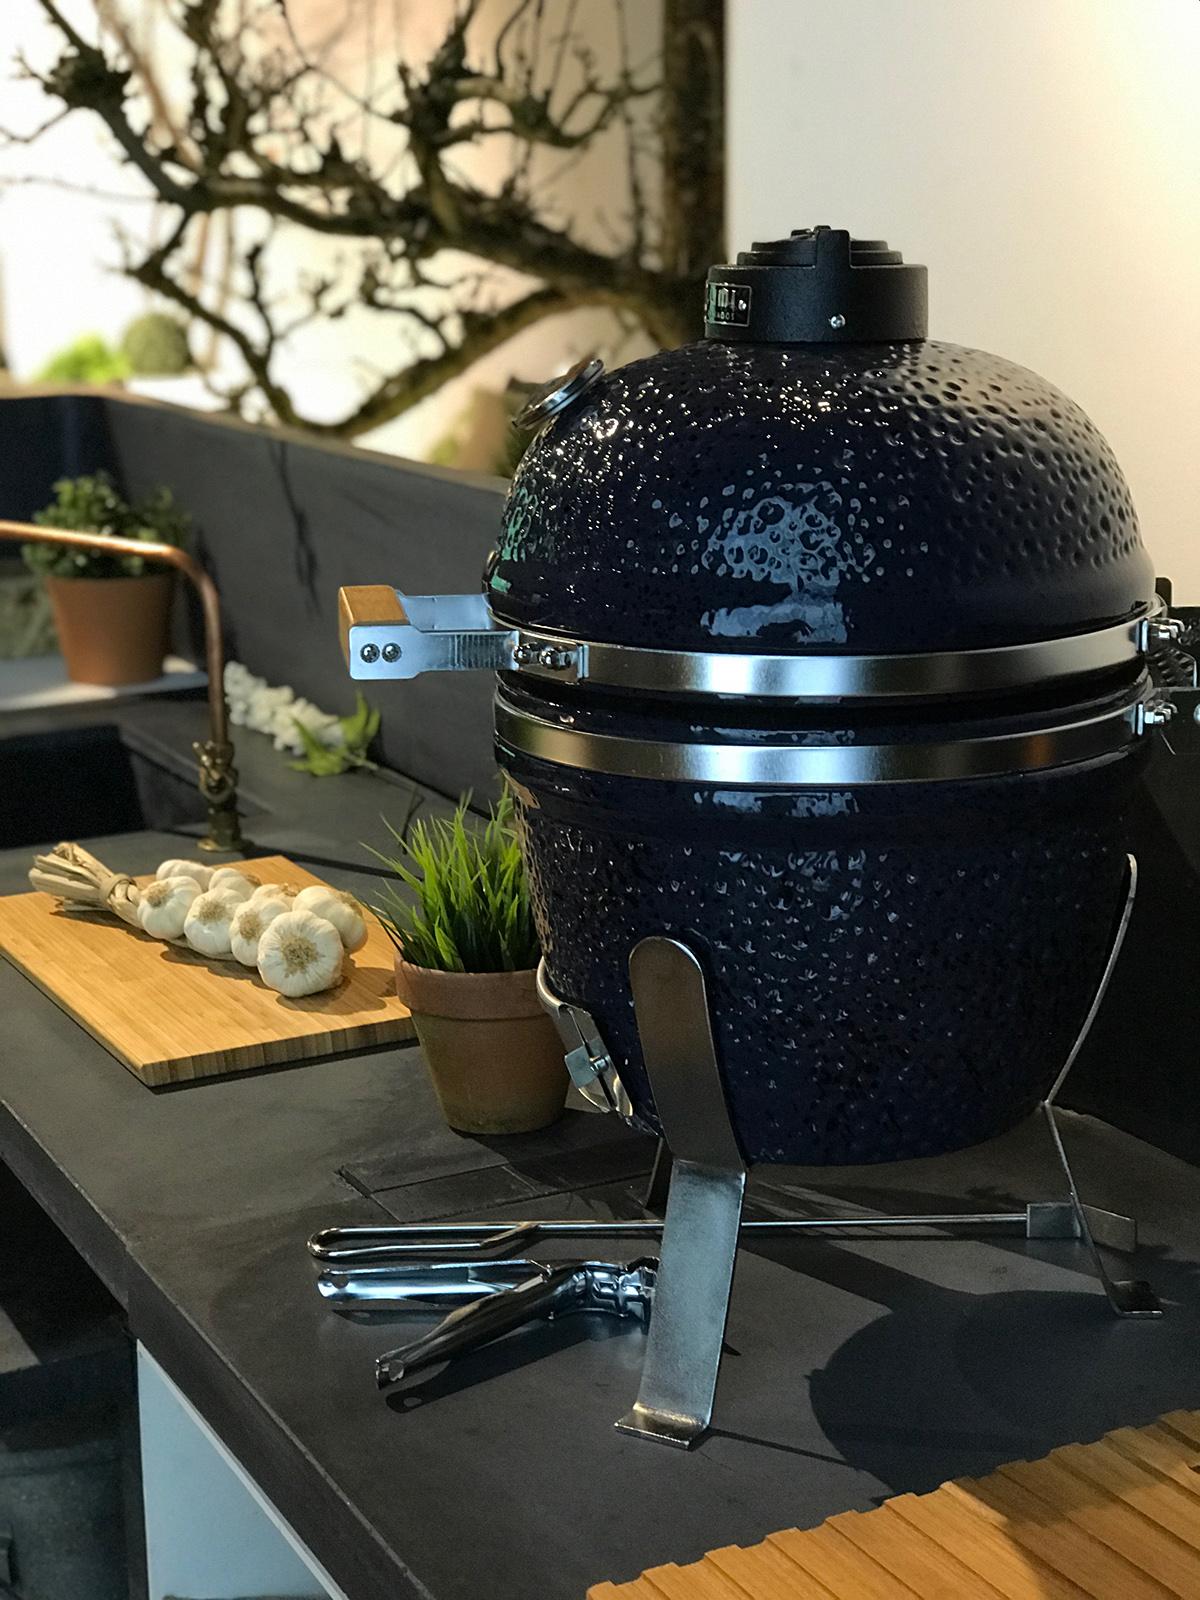 ETC Consumentendag, Big Green Egg Barbecue, blog Leem Wonen